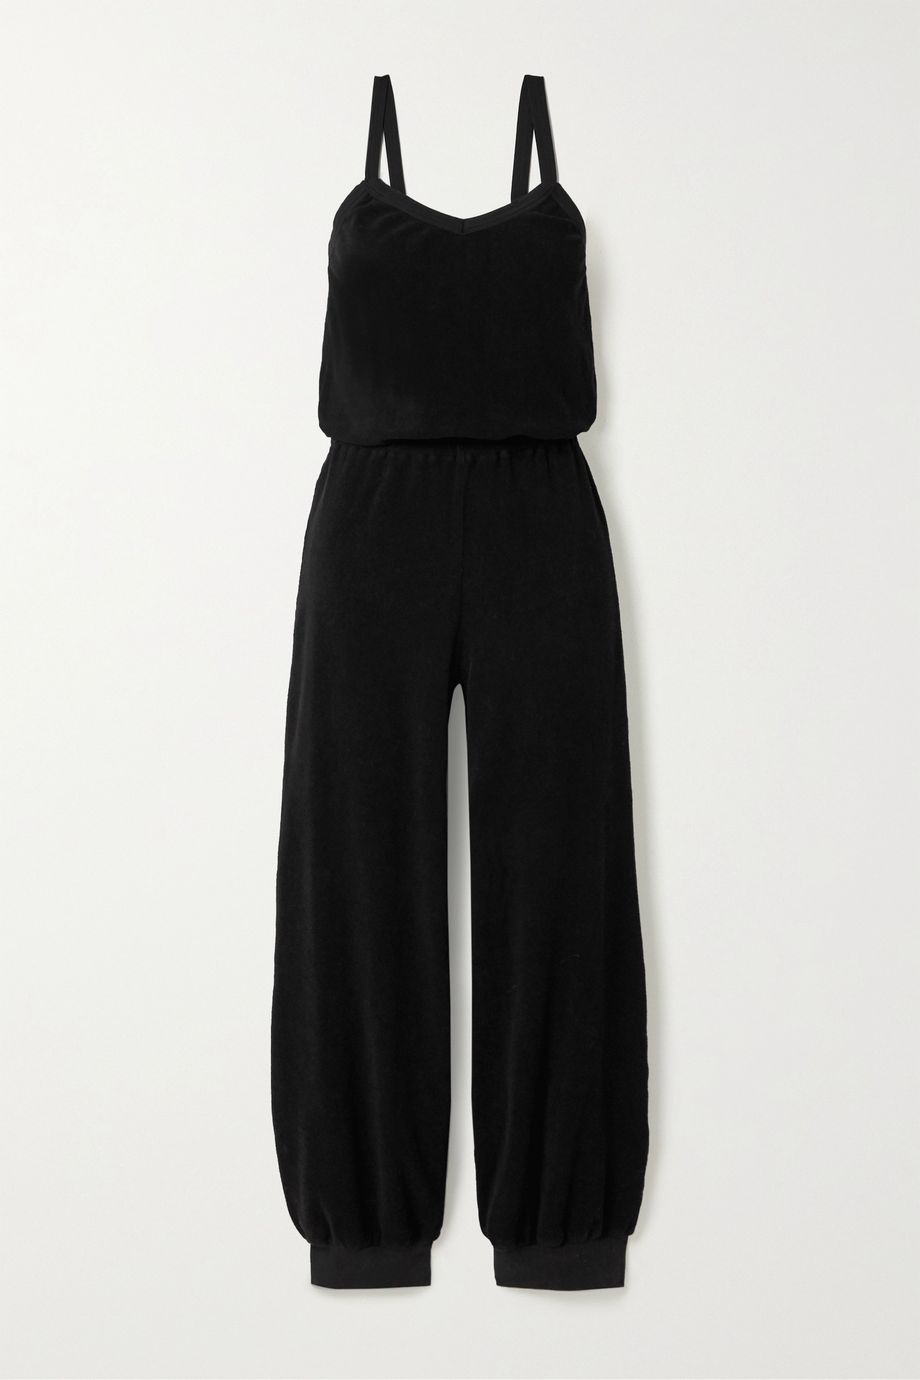 Suzie Kondi Cotton-terry jumpsuit